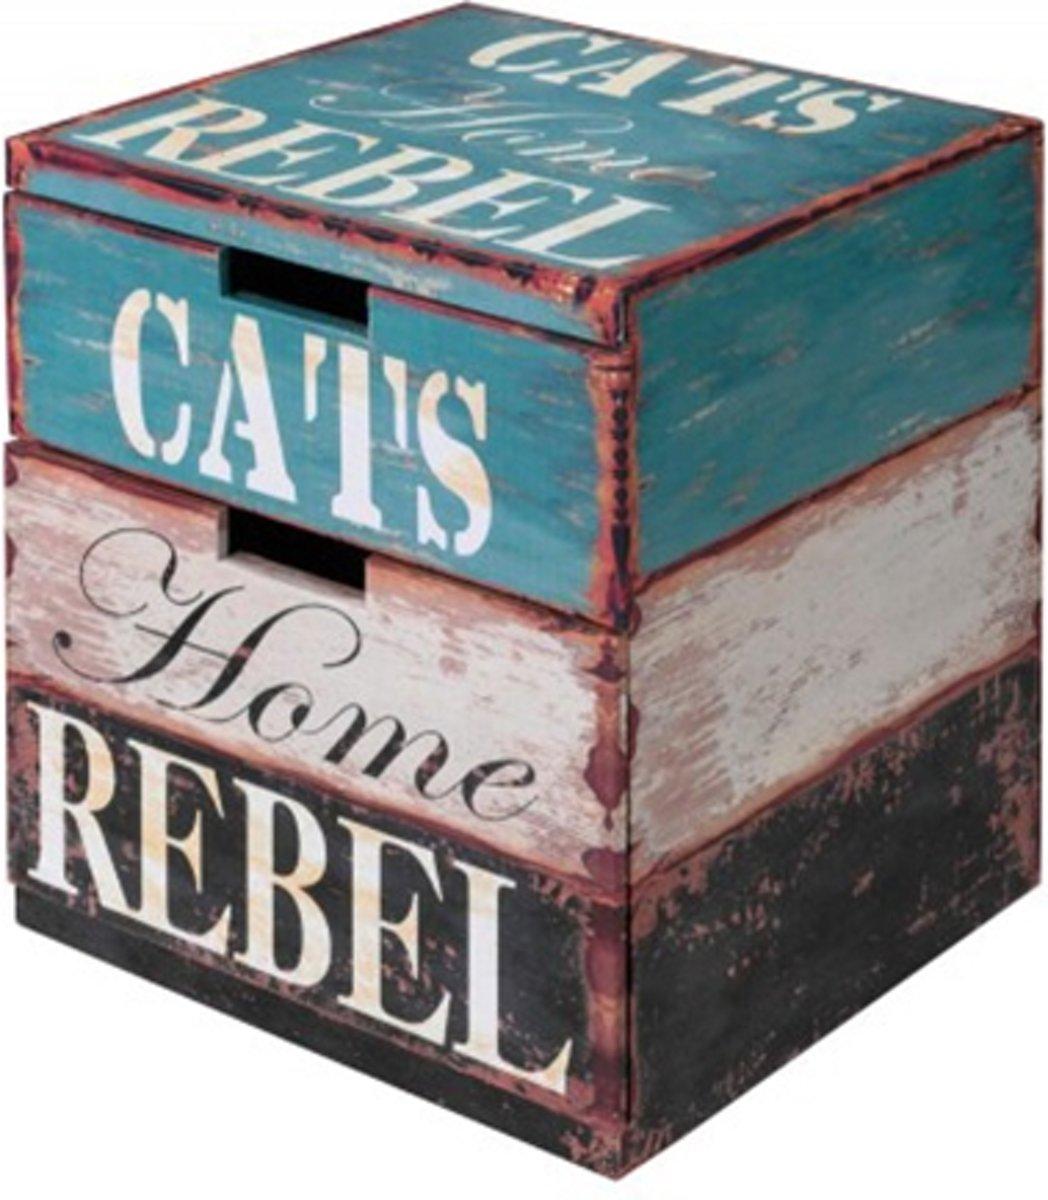 D&d katten box rebel